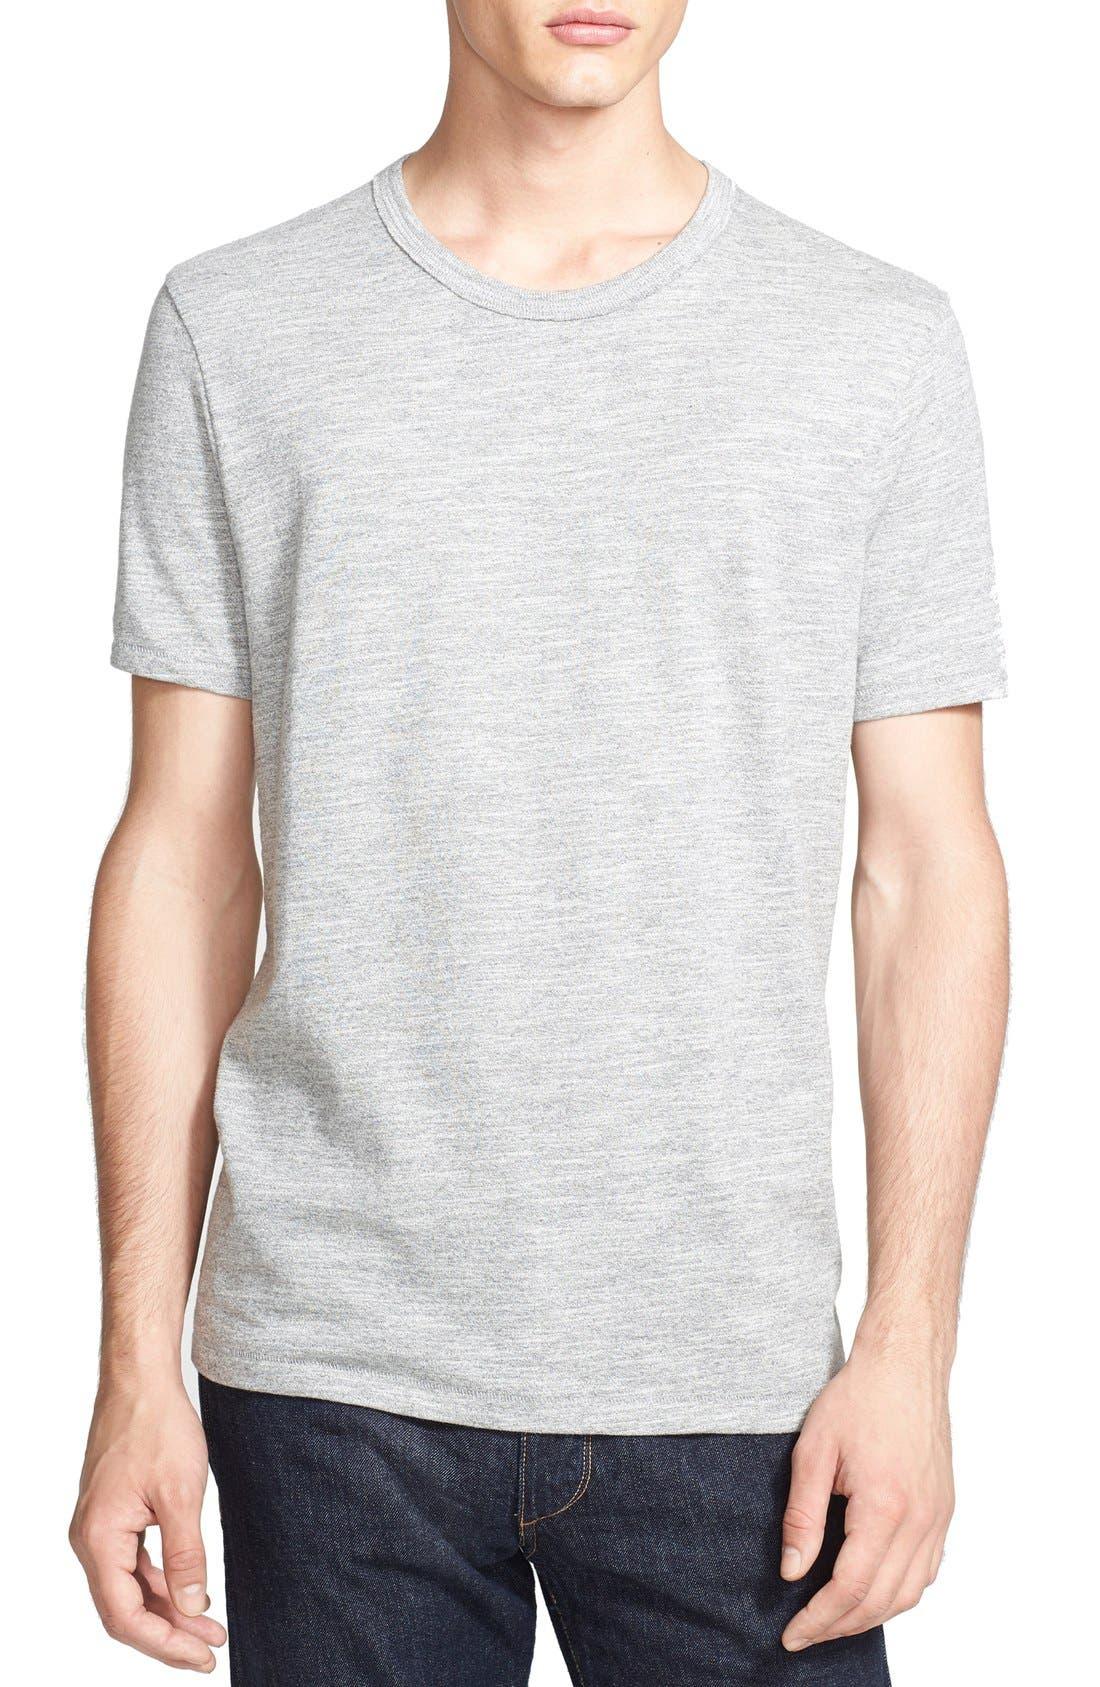 Alternate Image 1 Selected - rag & bone Standard Issue 'Moulinex' Crewneck T-Shirt